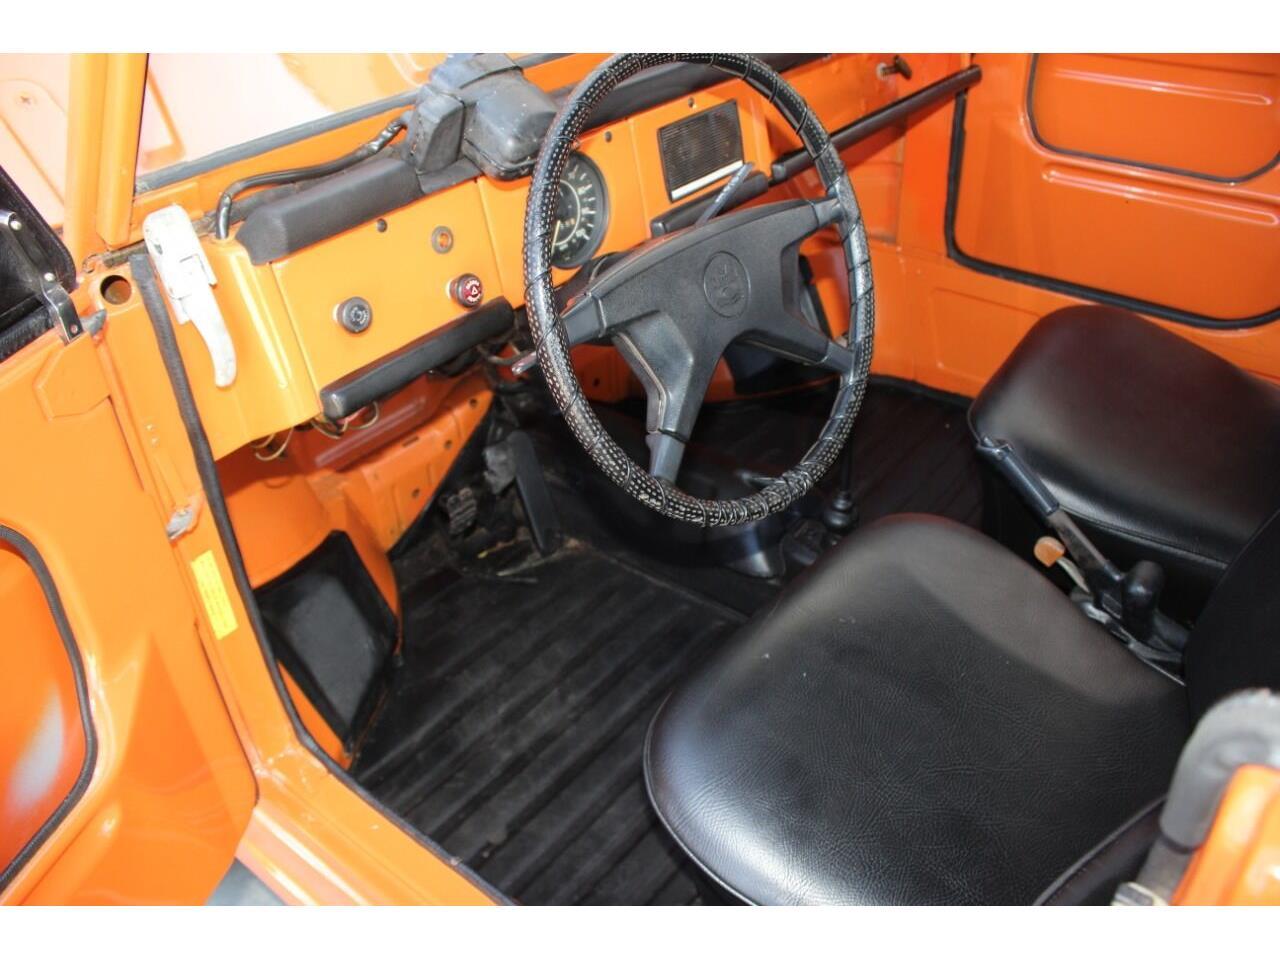 1974 Volkswagen Thing (CC-1297806) for sale in La Verne, California